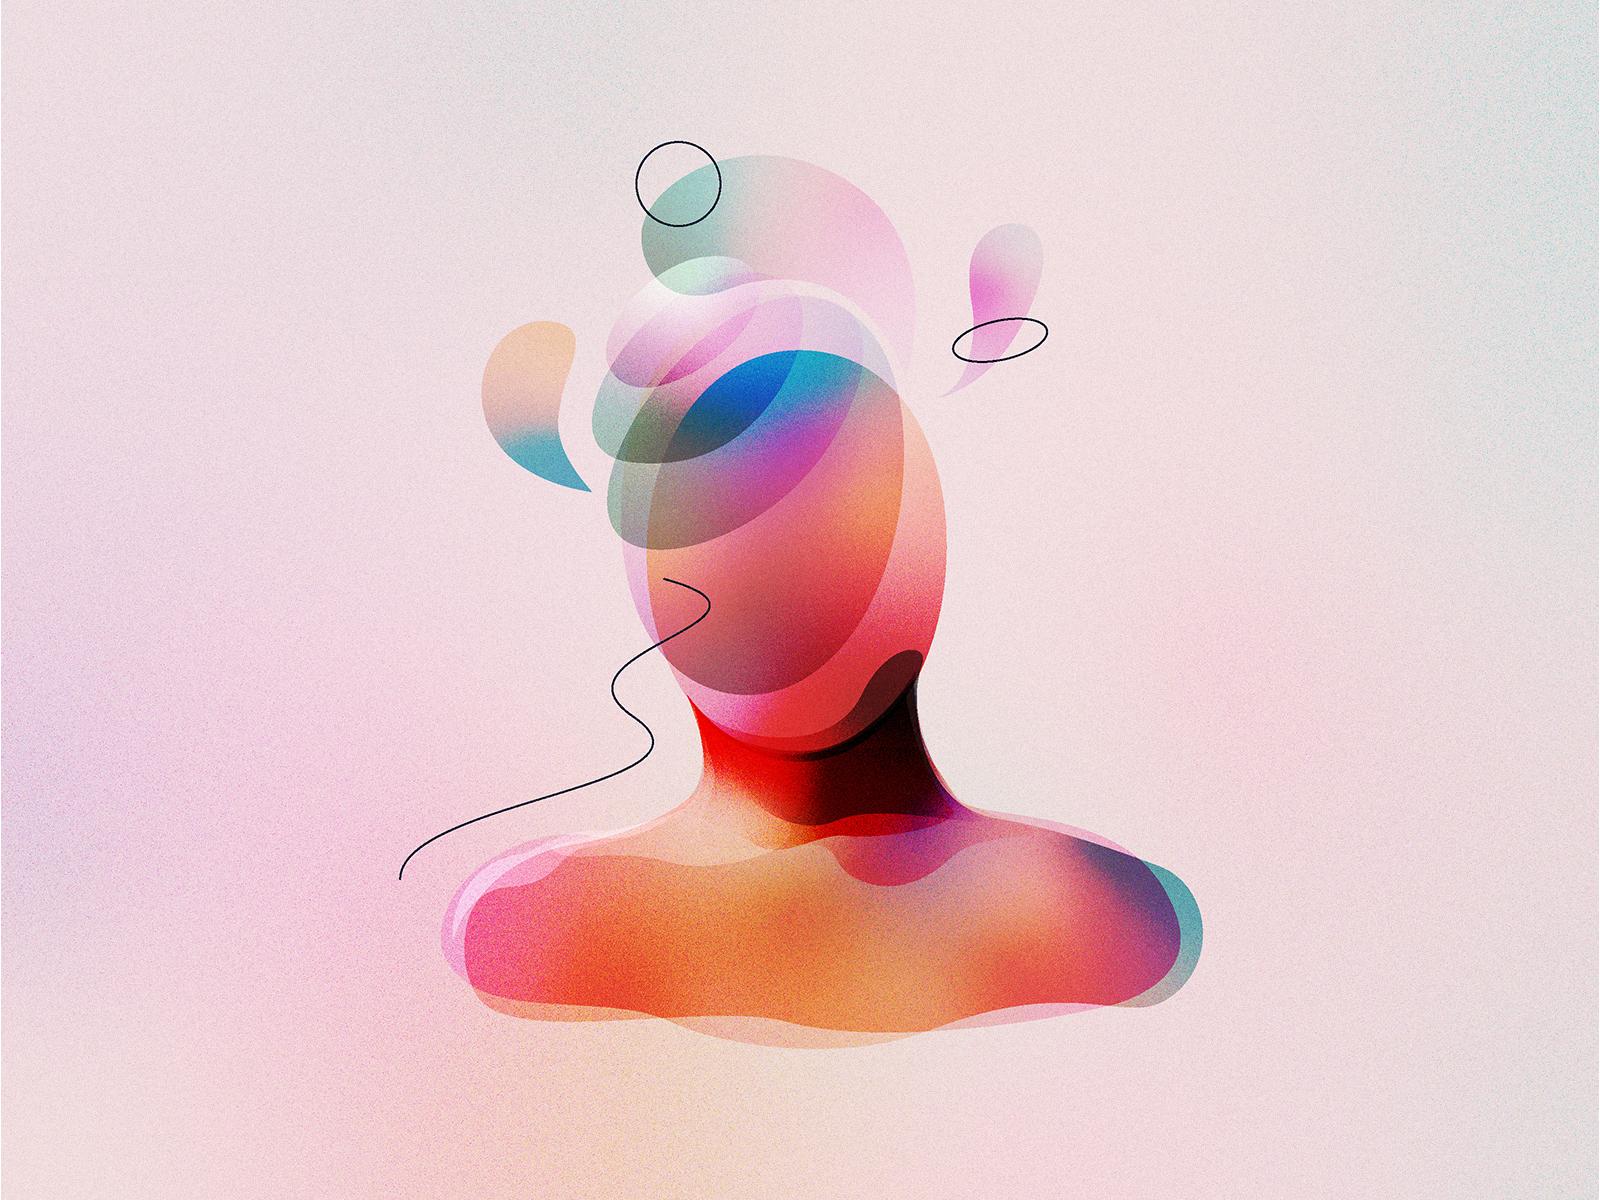 Surreal human mind illustration by antlii 4x